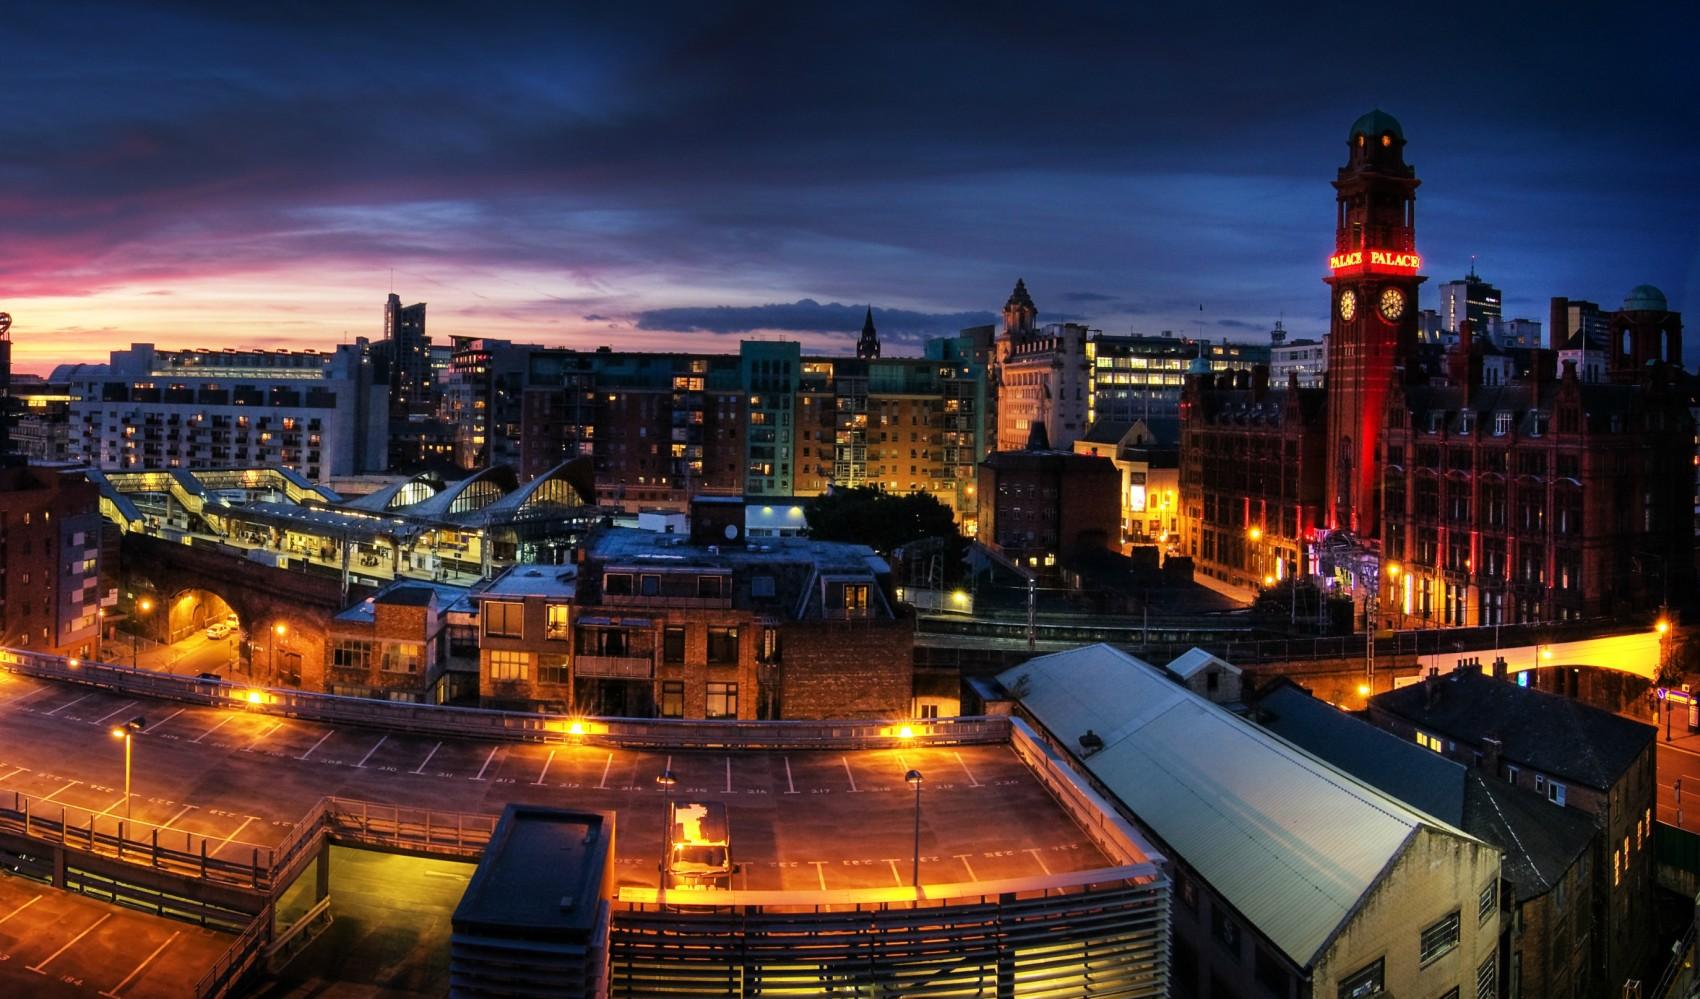 ManchesterCropped-1700x999.jpg